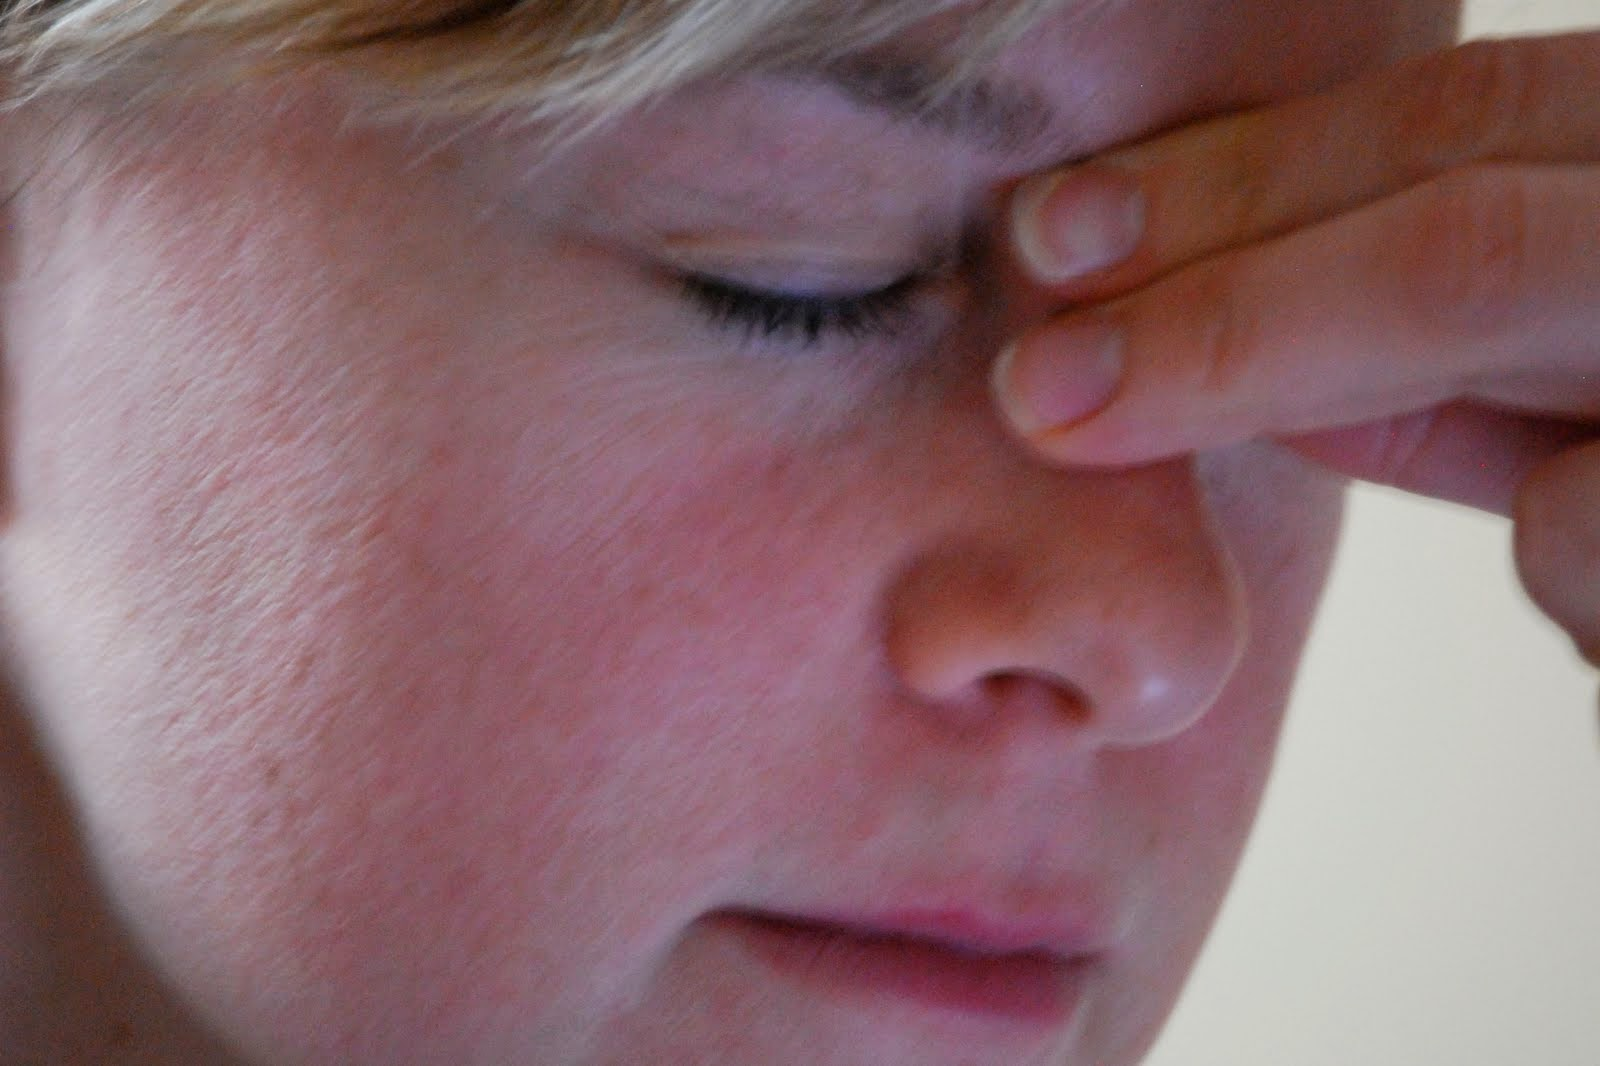 Obat Tradisional Penyakit Sinusitis Secara Alami